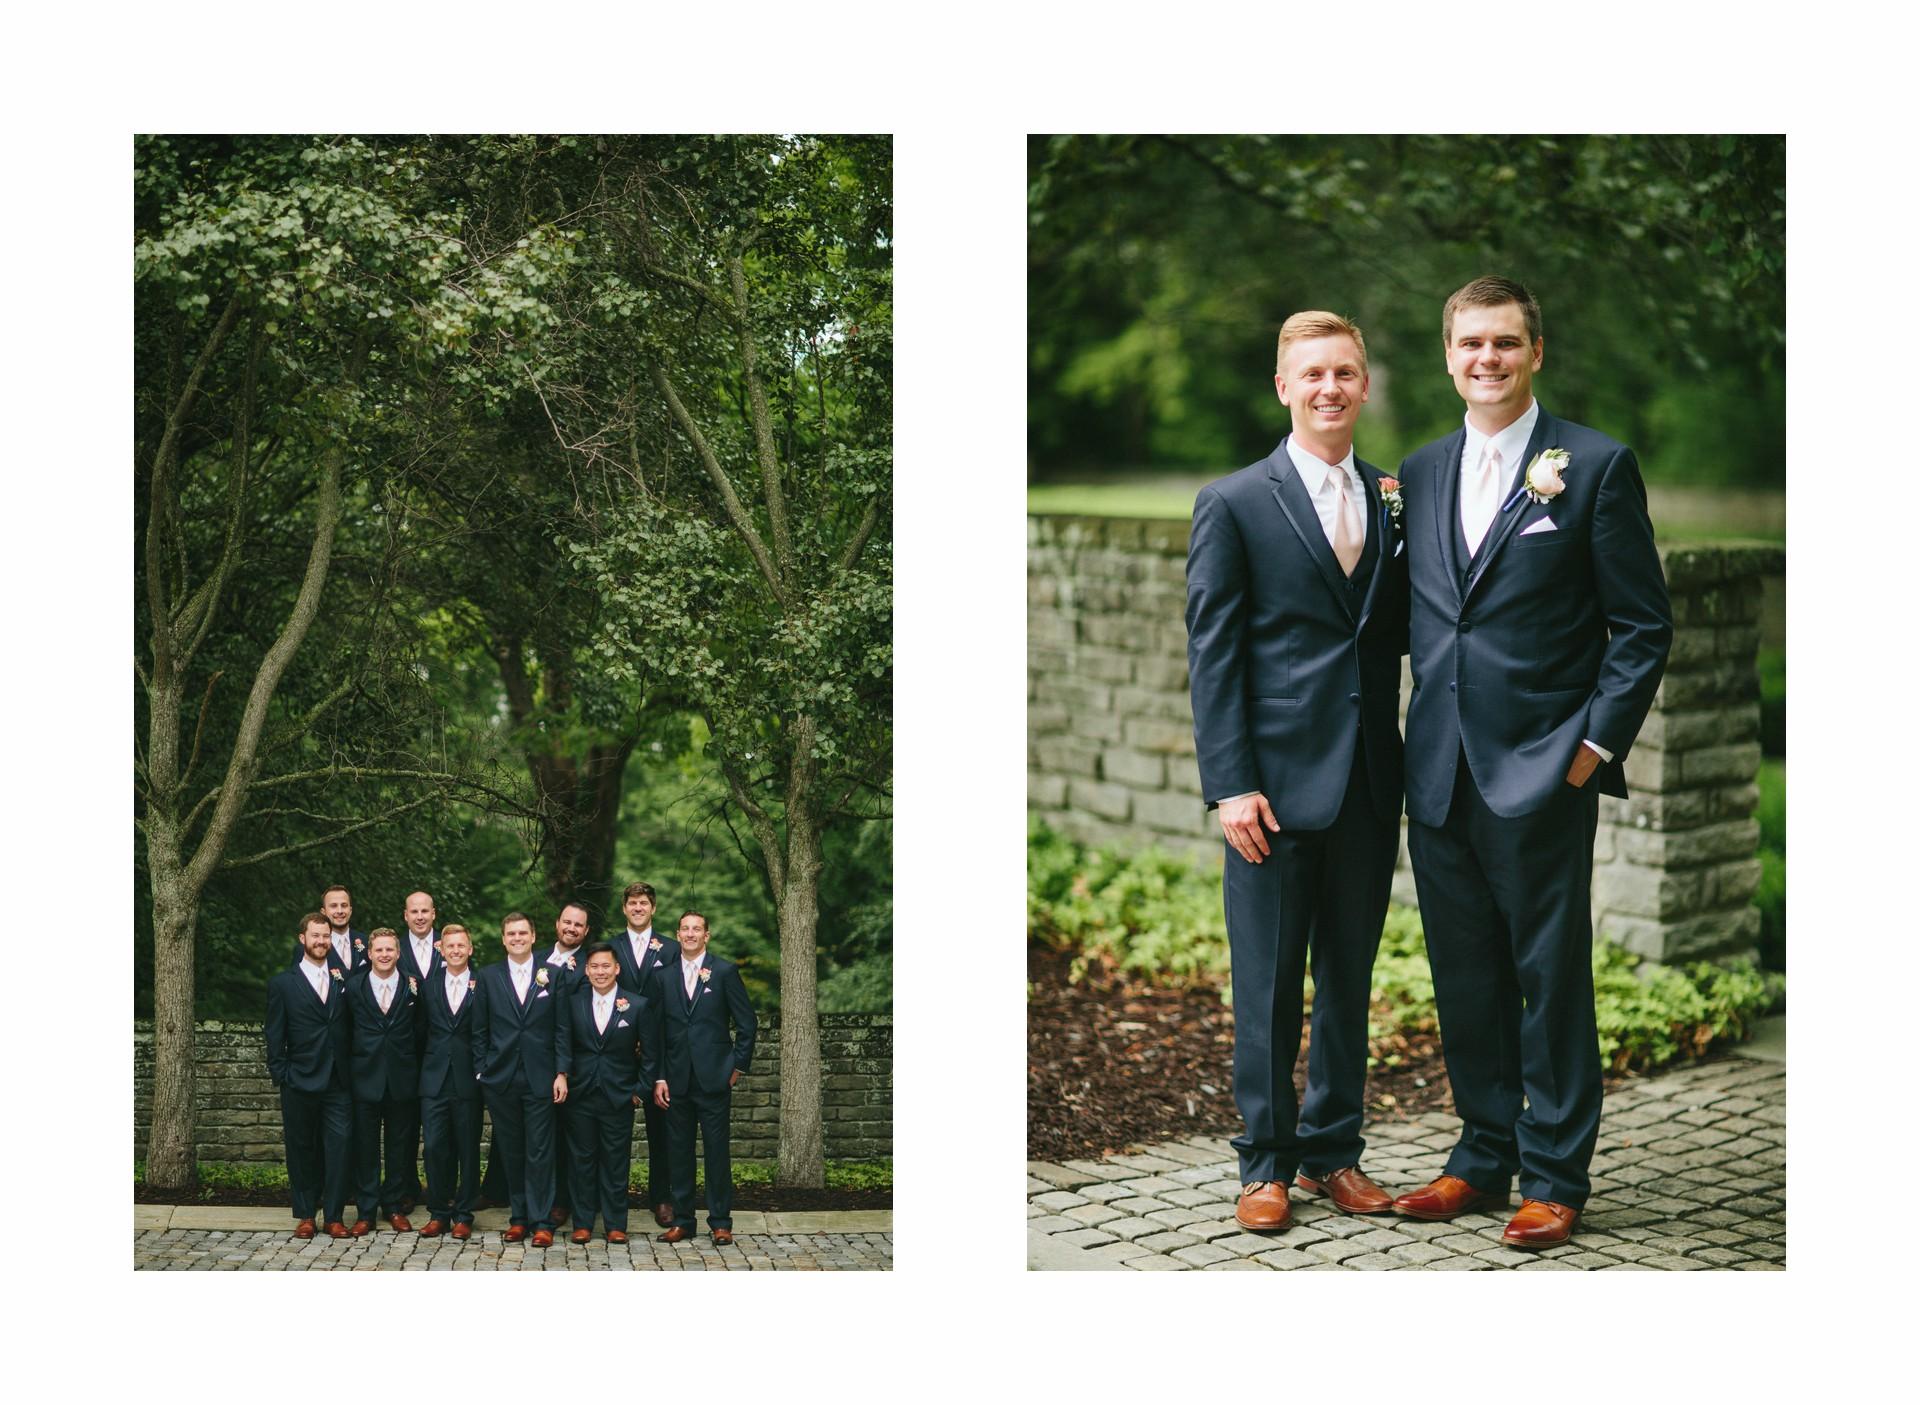 Bolton House Wedding Photographer in Beachwood 57.jpg